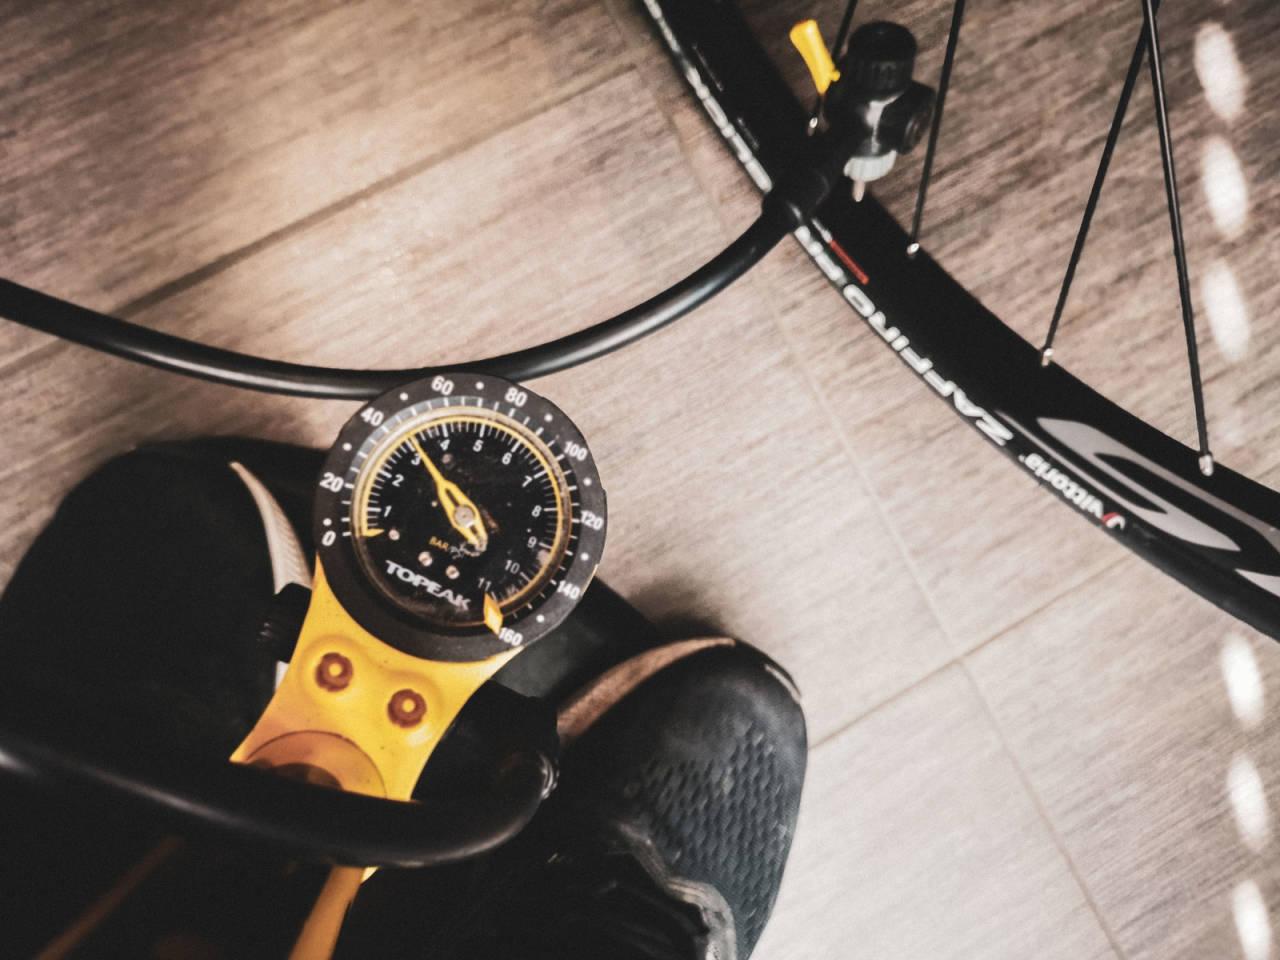 Sykkelpumpe til racersykler